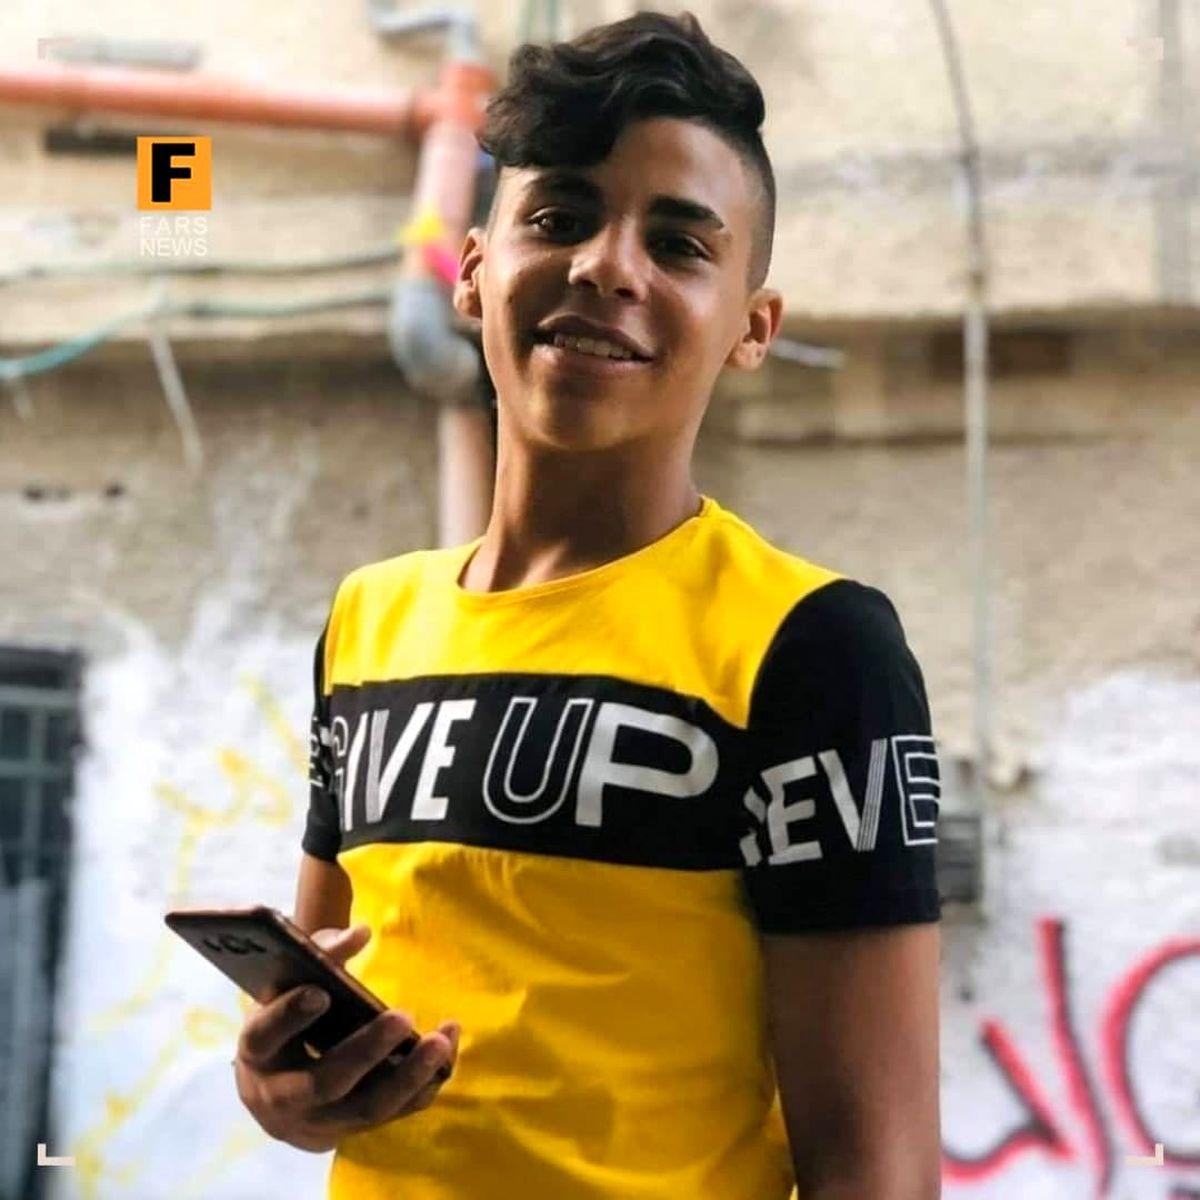 نوجوان فلسطینی ذبح شد